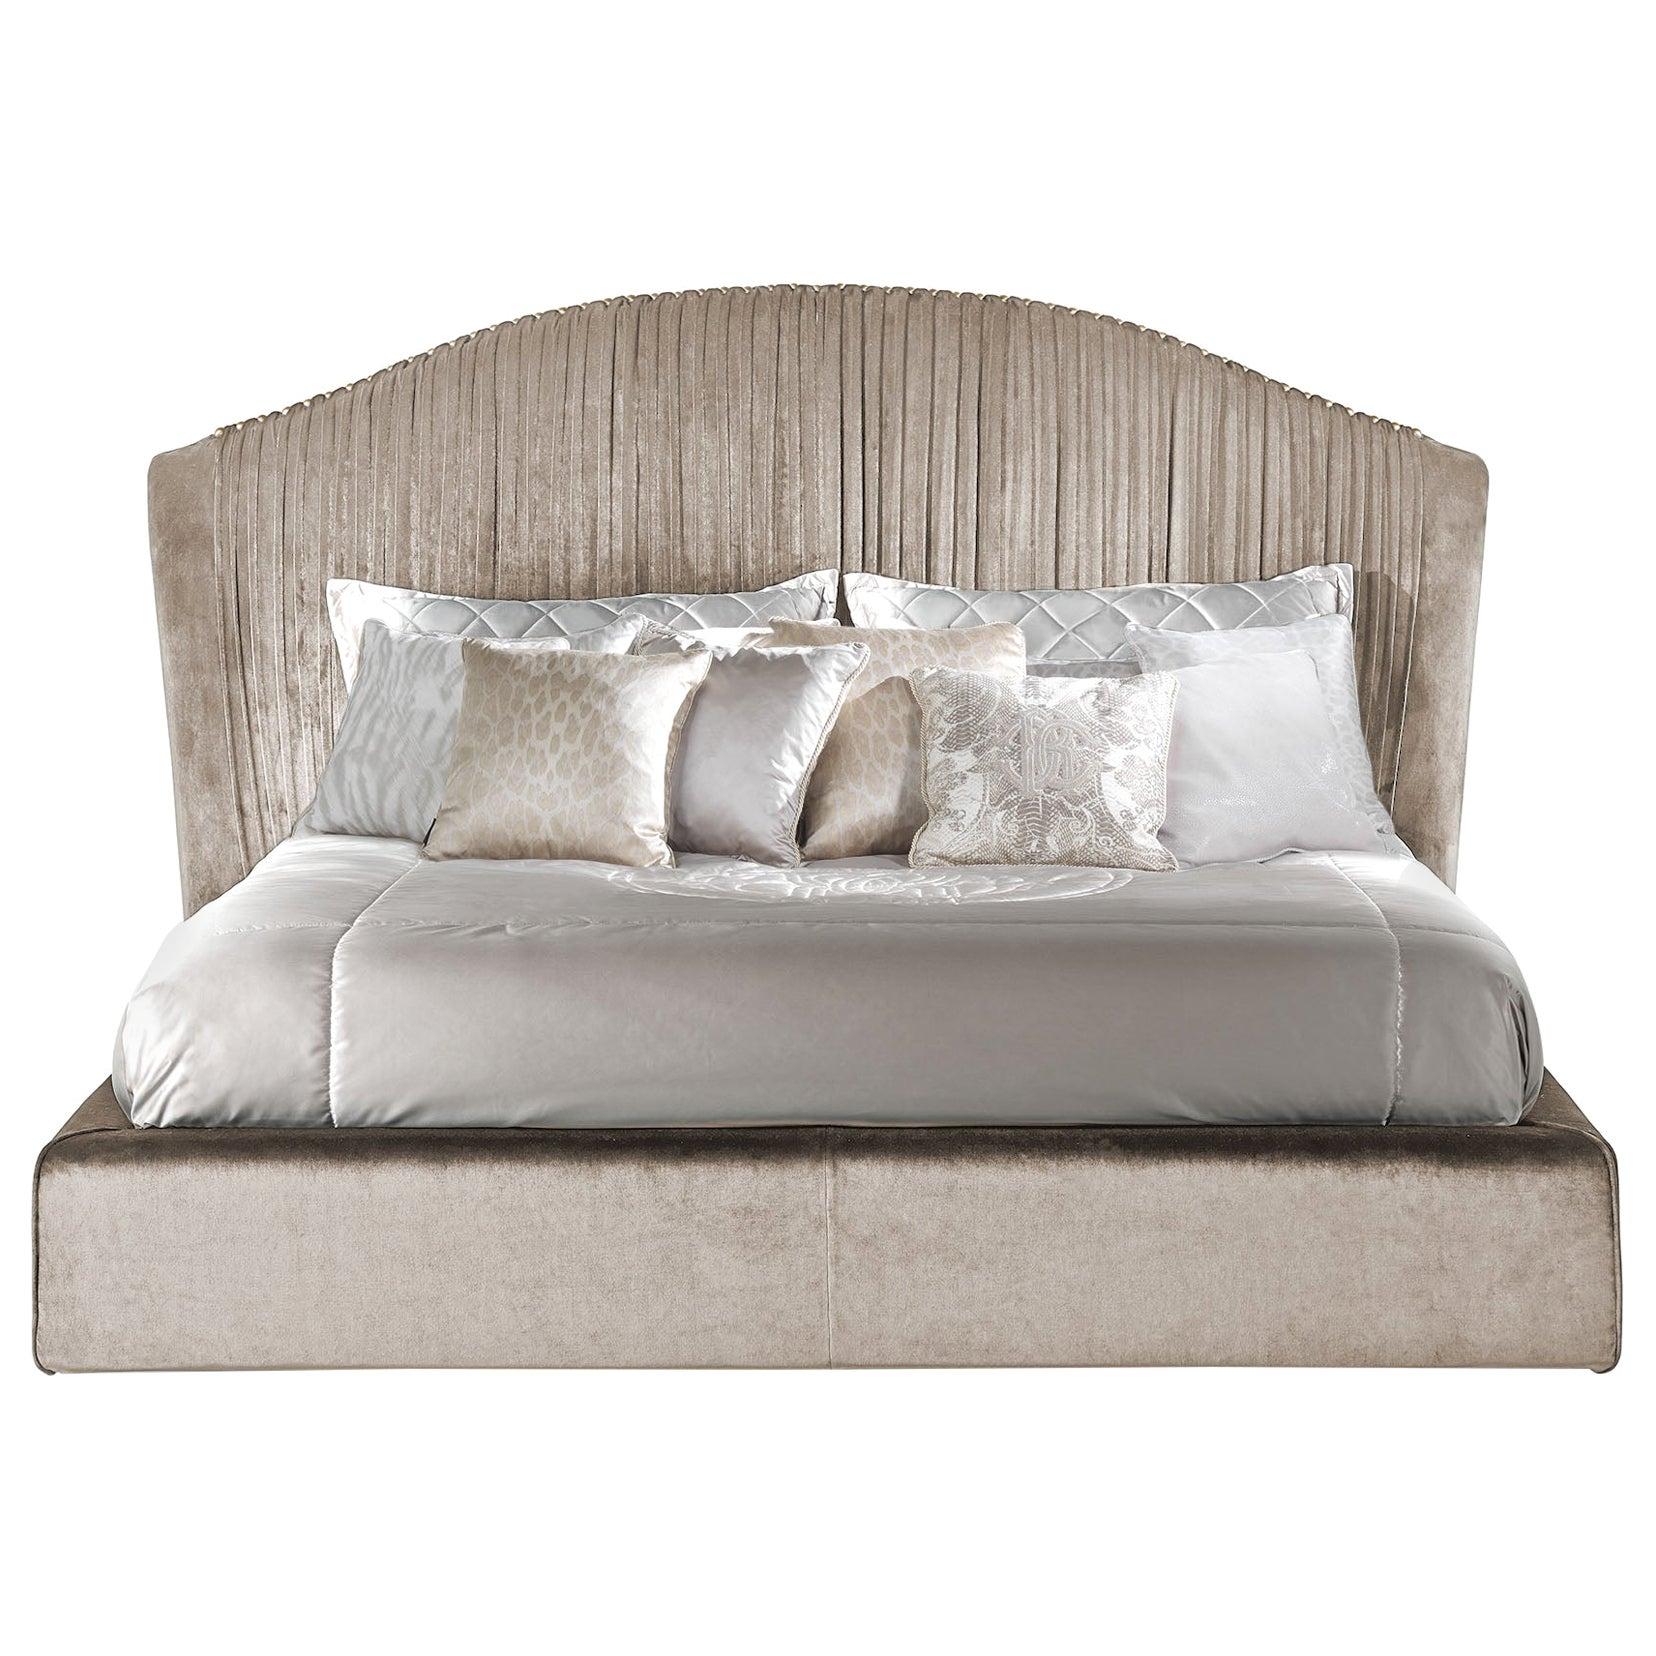 Sharpei Bed in Sand Velvet by Roberto Cavalli Home Interiors